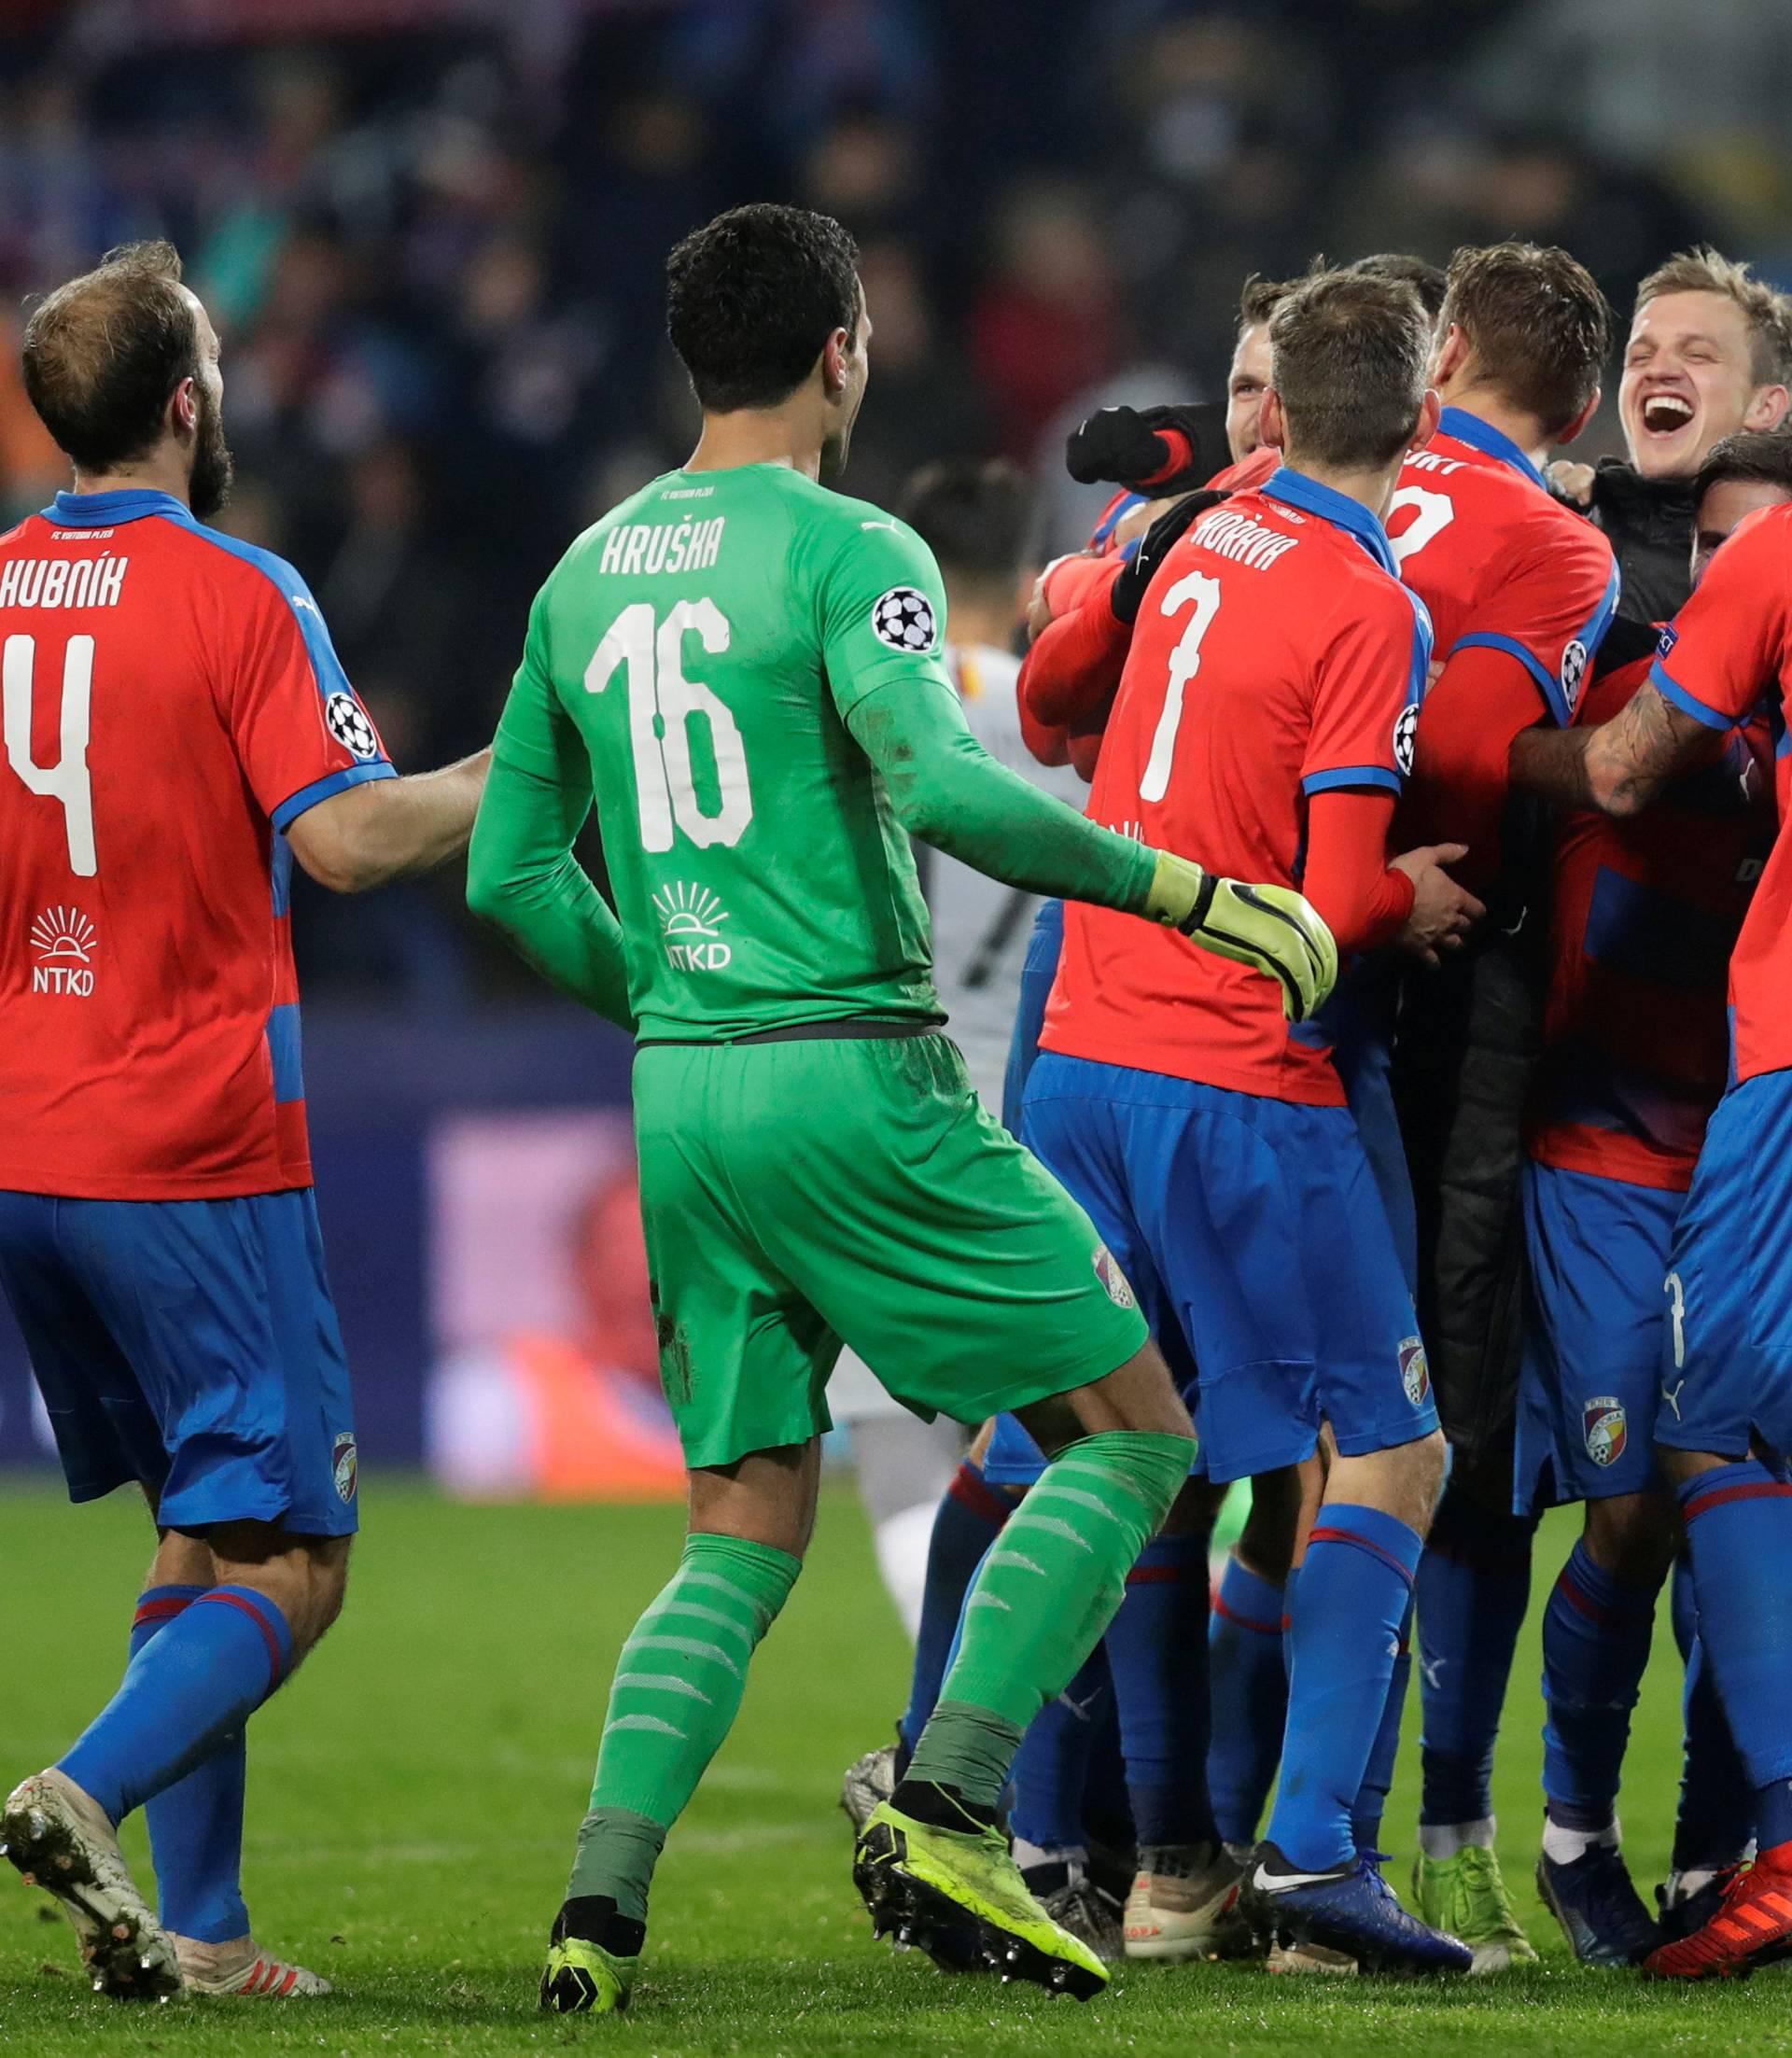 Champions League - Group Stage - Group G - Viktoria Plzen v AS Roma